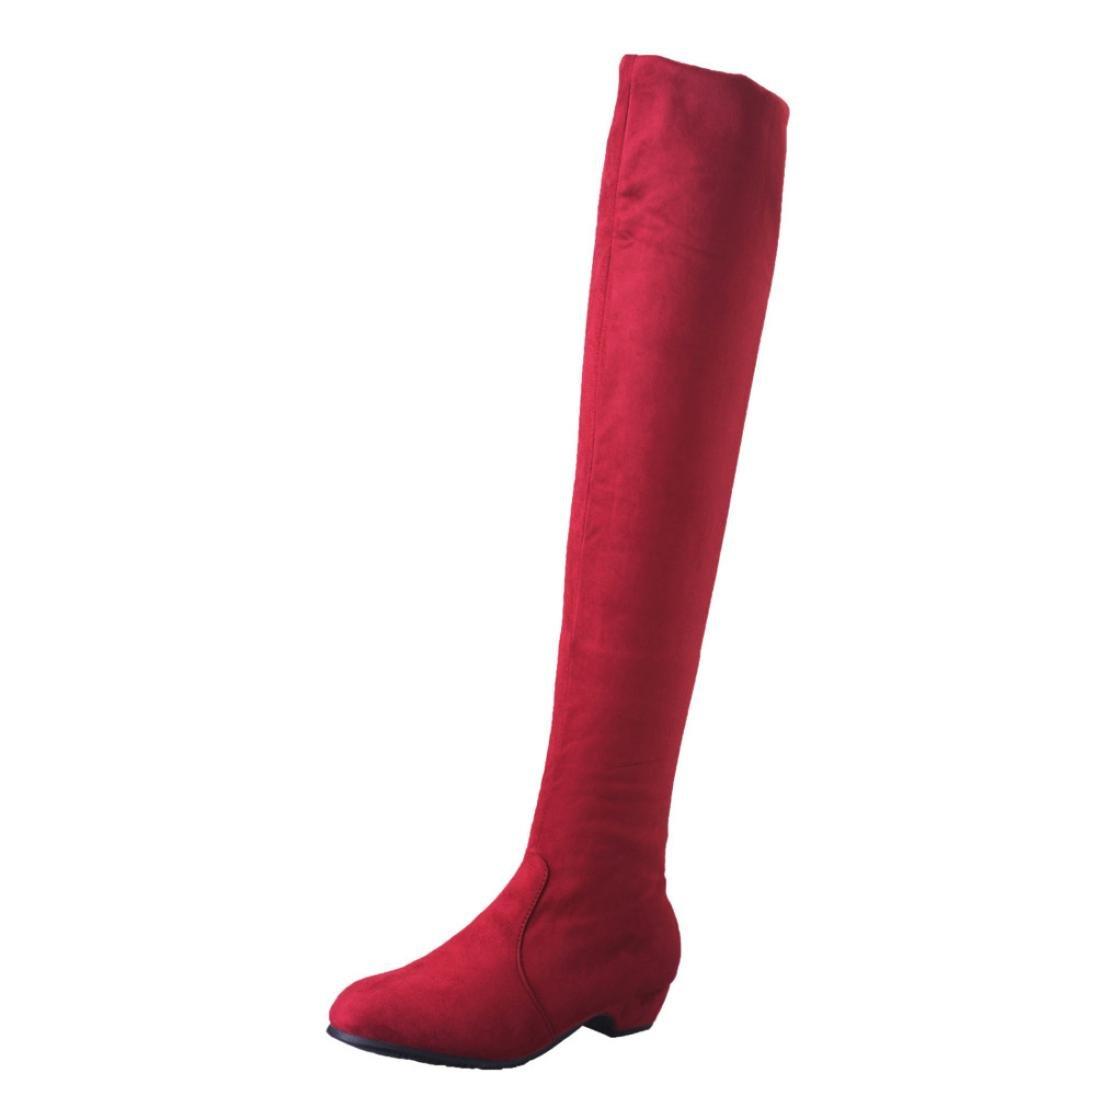 Women Winter Autumn Flat Boots Shoes High Leg Suede Short Long Boots by XILALU